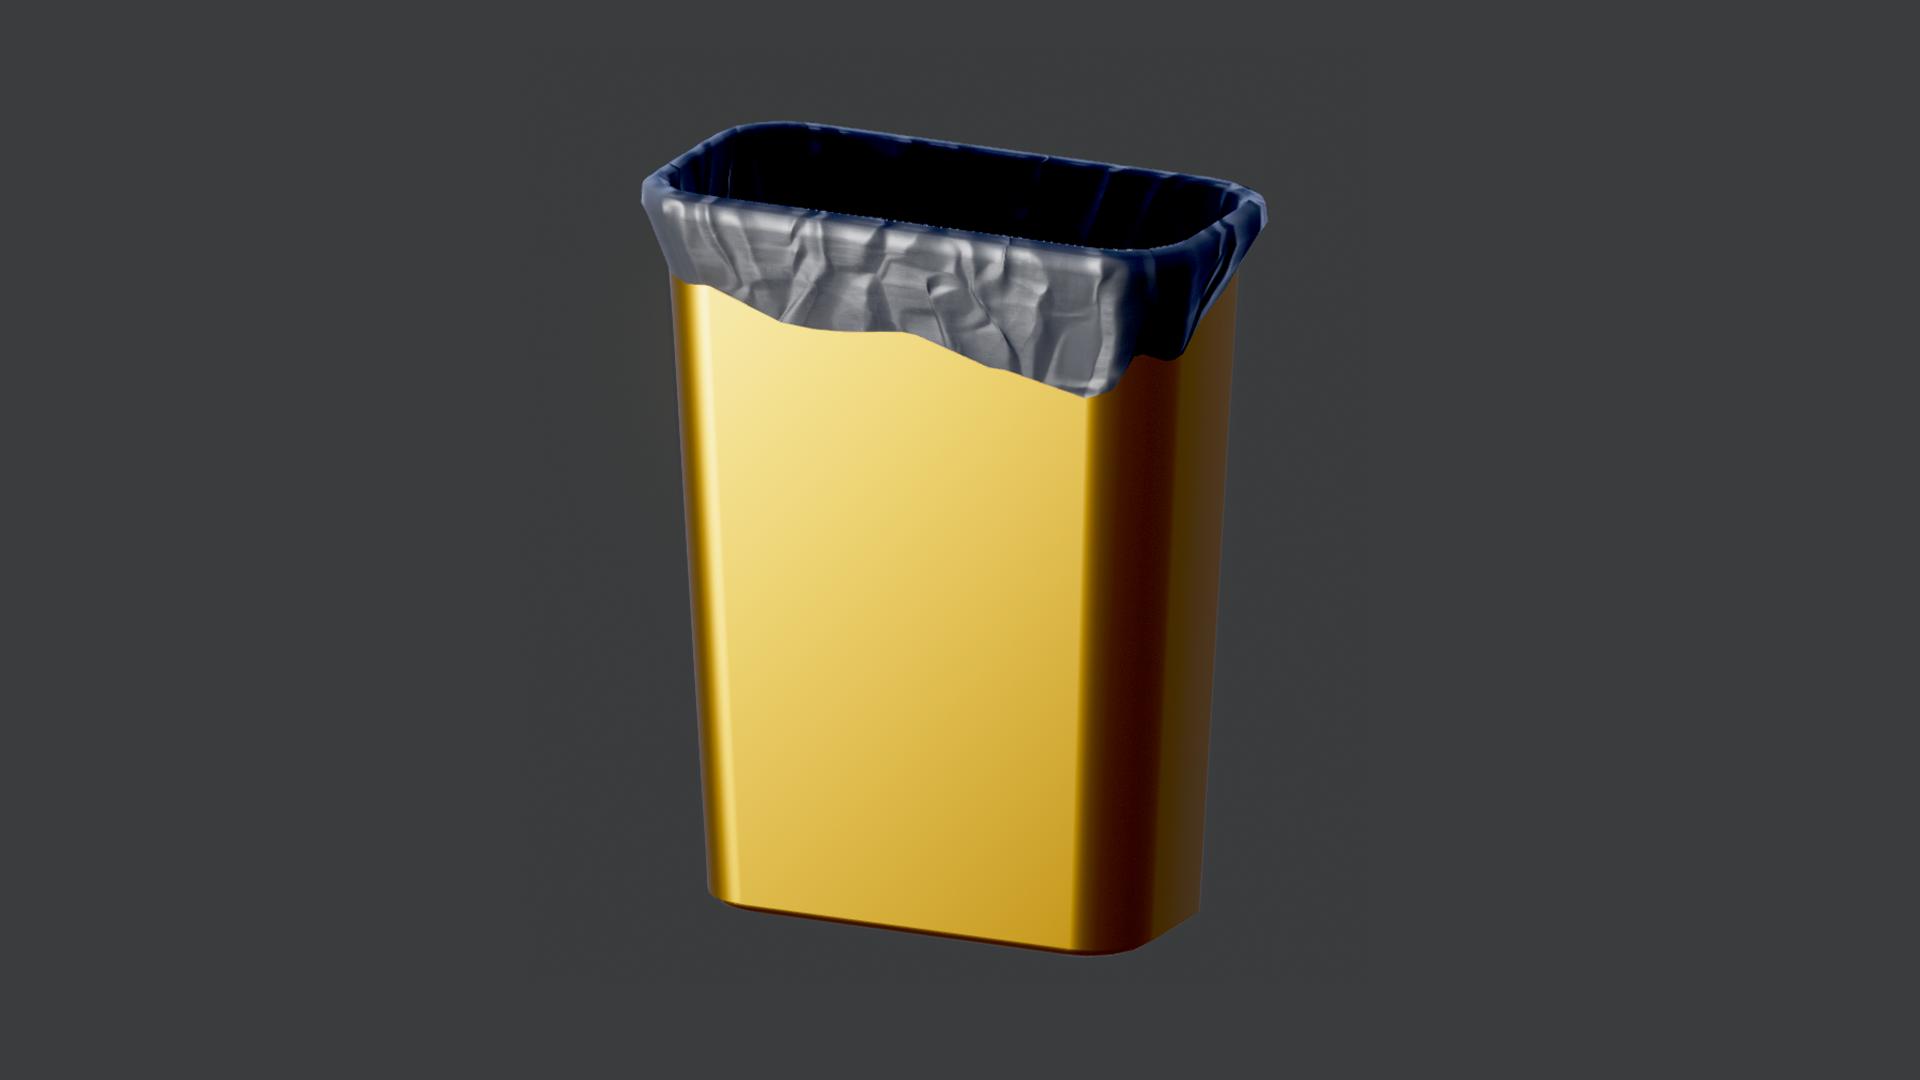 Take Your Trash Elsewhere